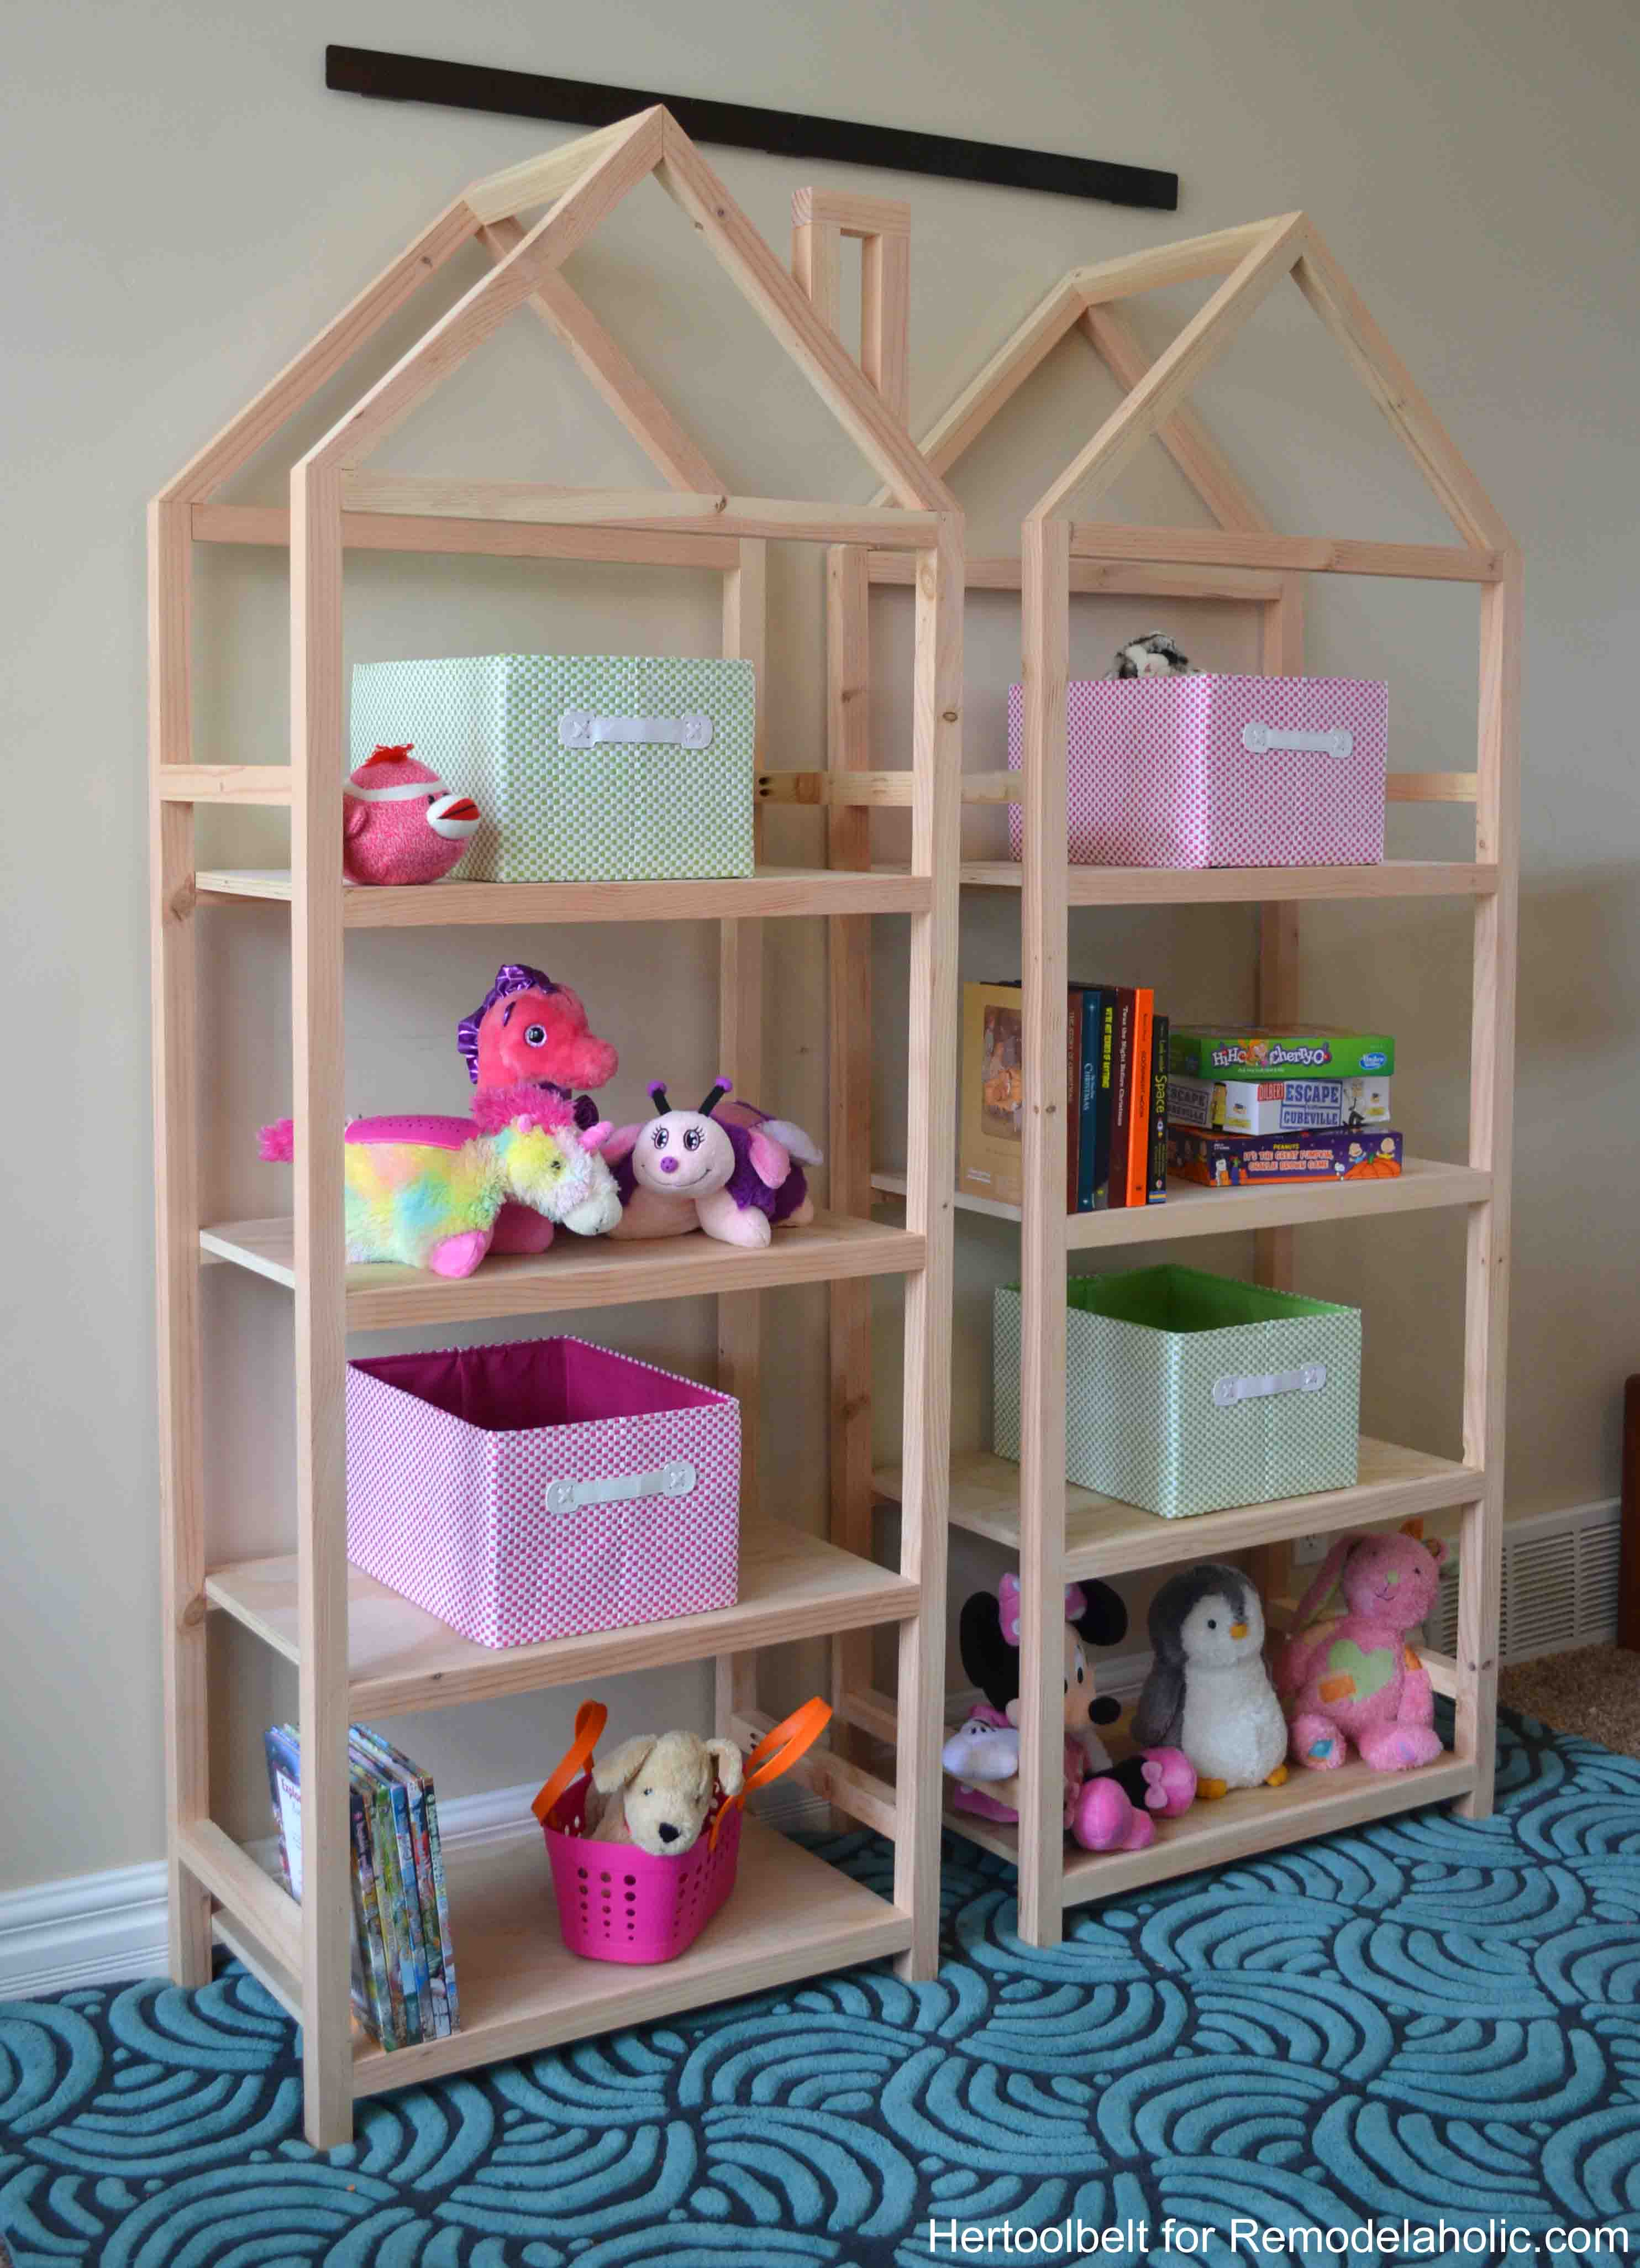 diy house frame bookshelf plans remodelaholic bloglovin